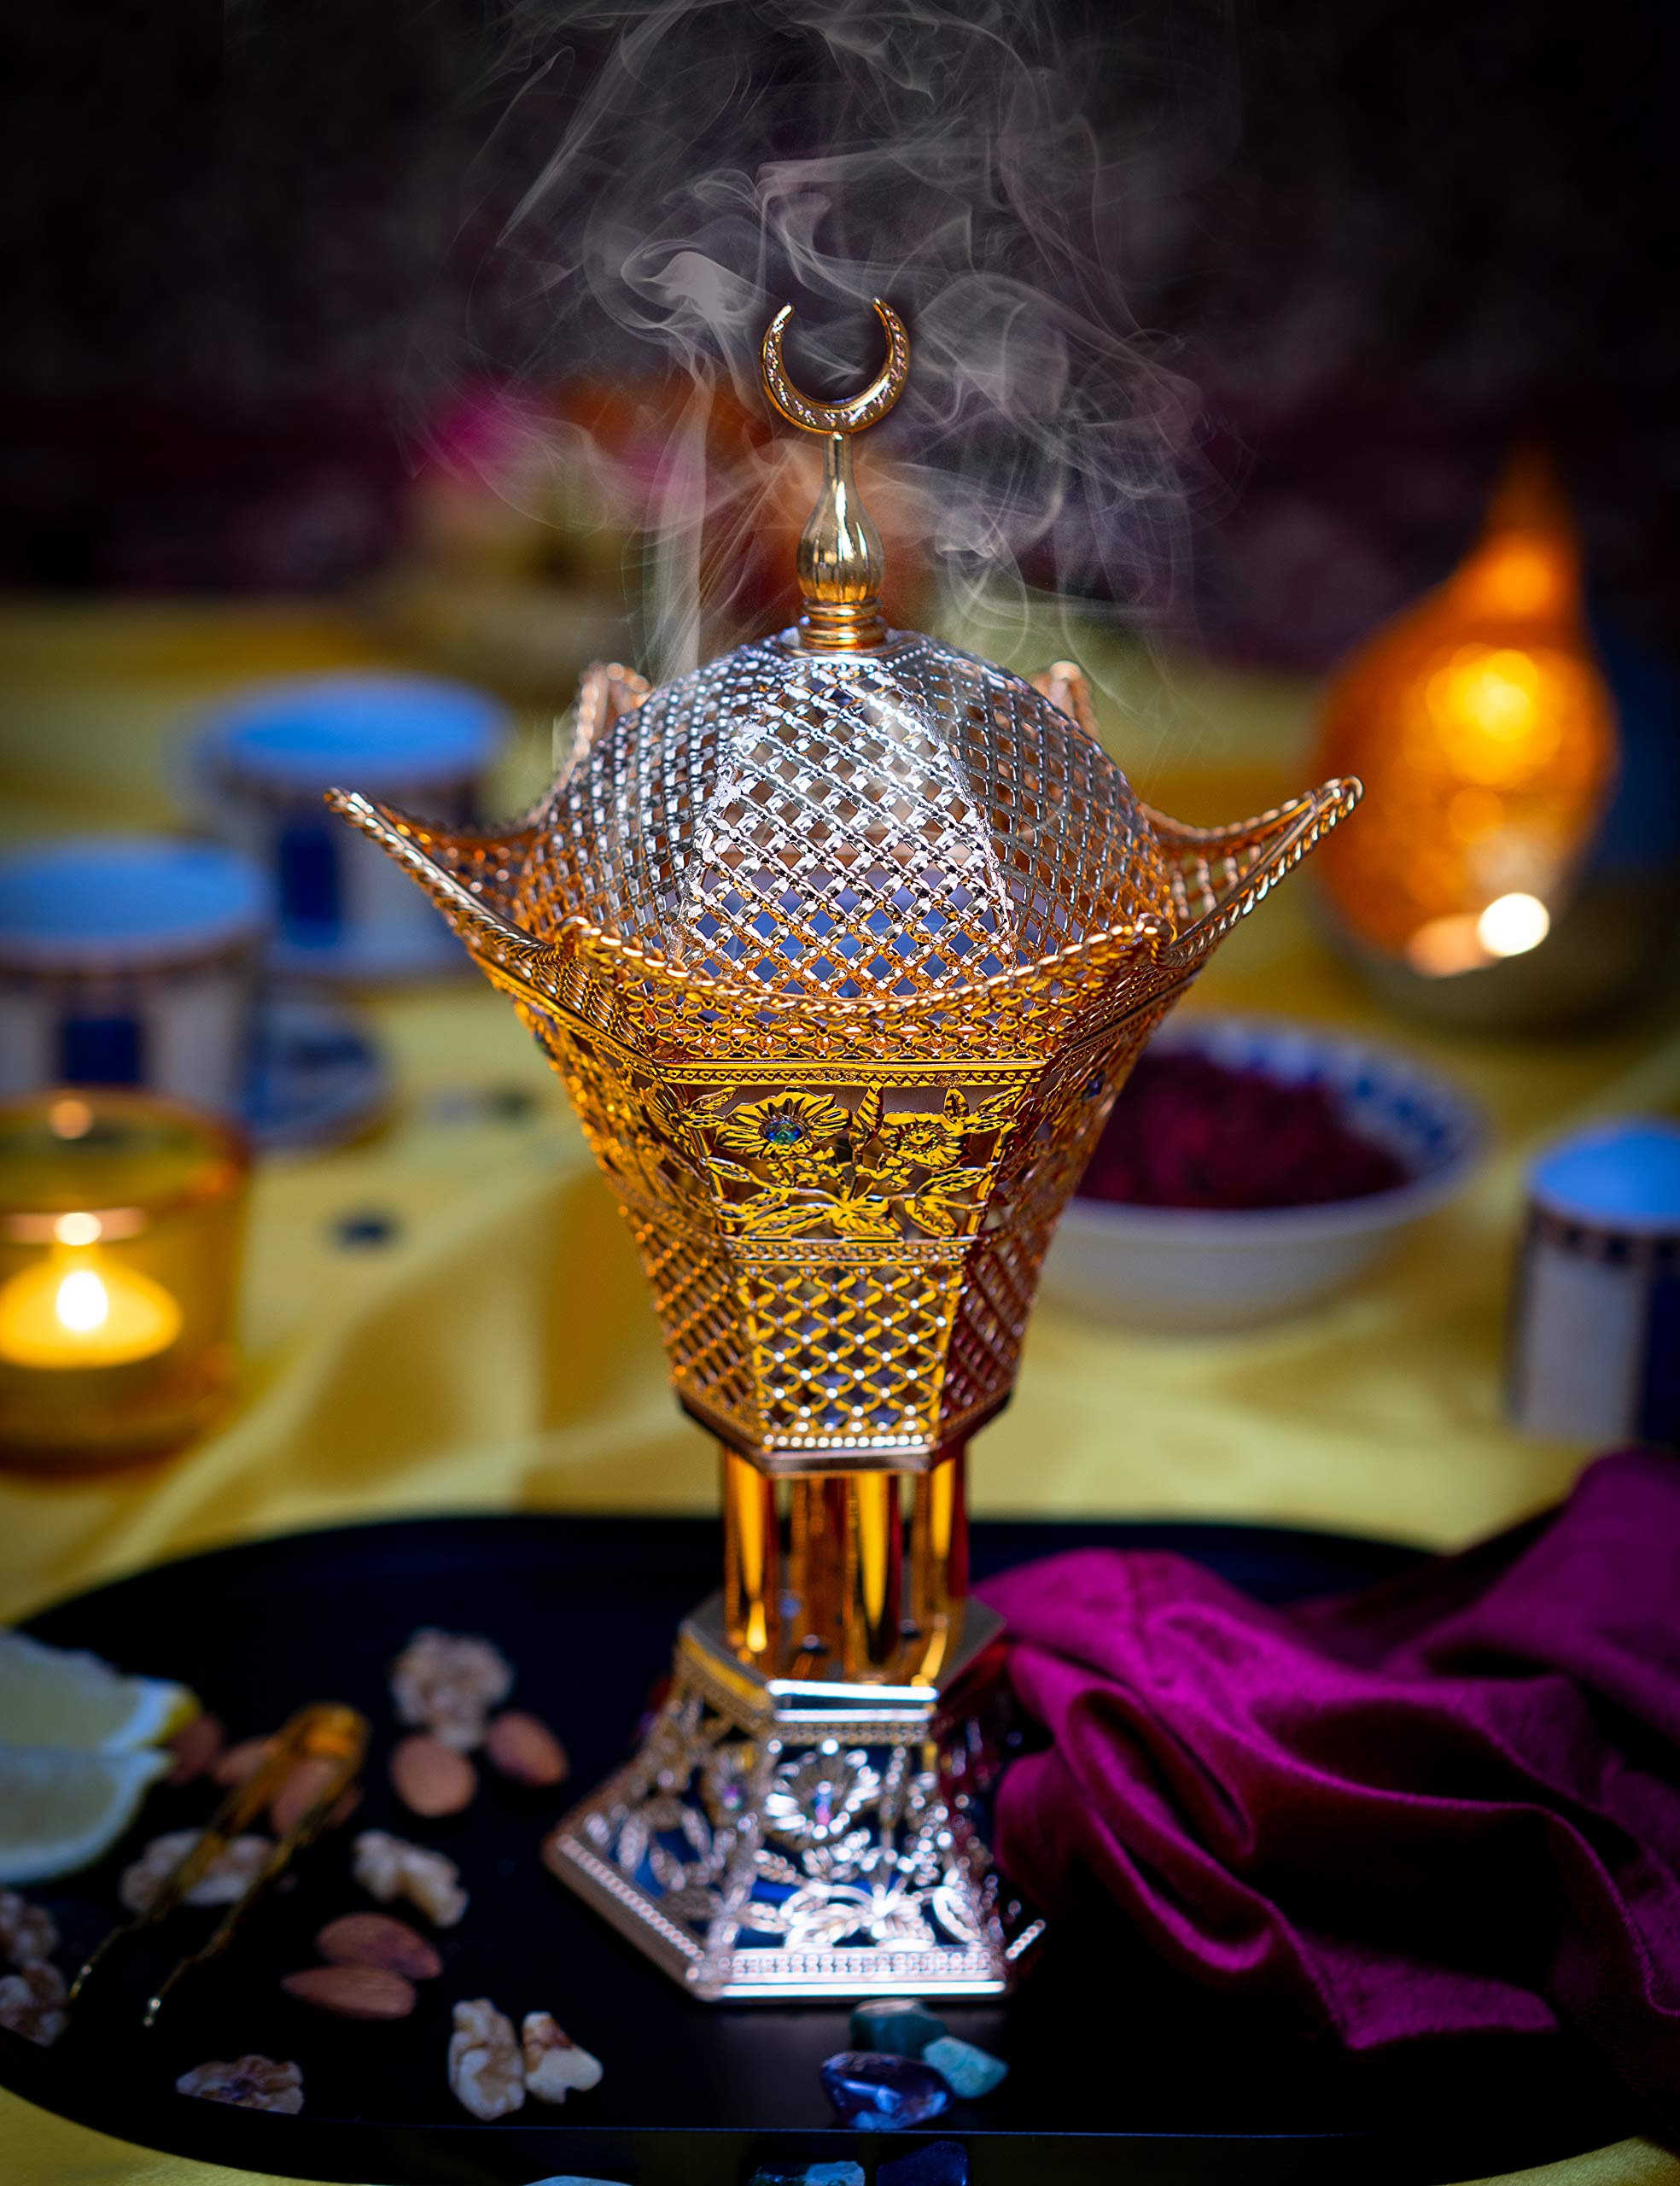 AM Bakhoor Charcoal Incense Burner - Oud Frankincense Resin Burner 10.5 Inches Tall - for Bakhoor Oud Incense Sticks Cones - Luxury Filigree, Gold by AM (Image #2)